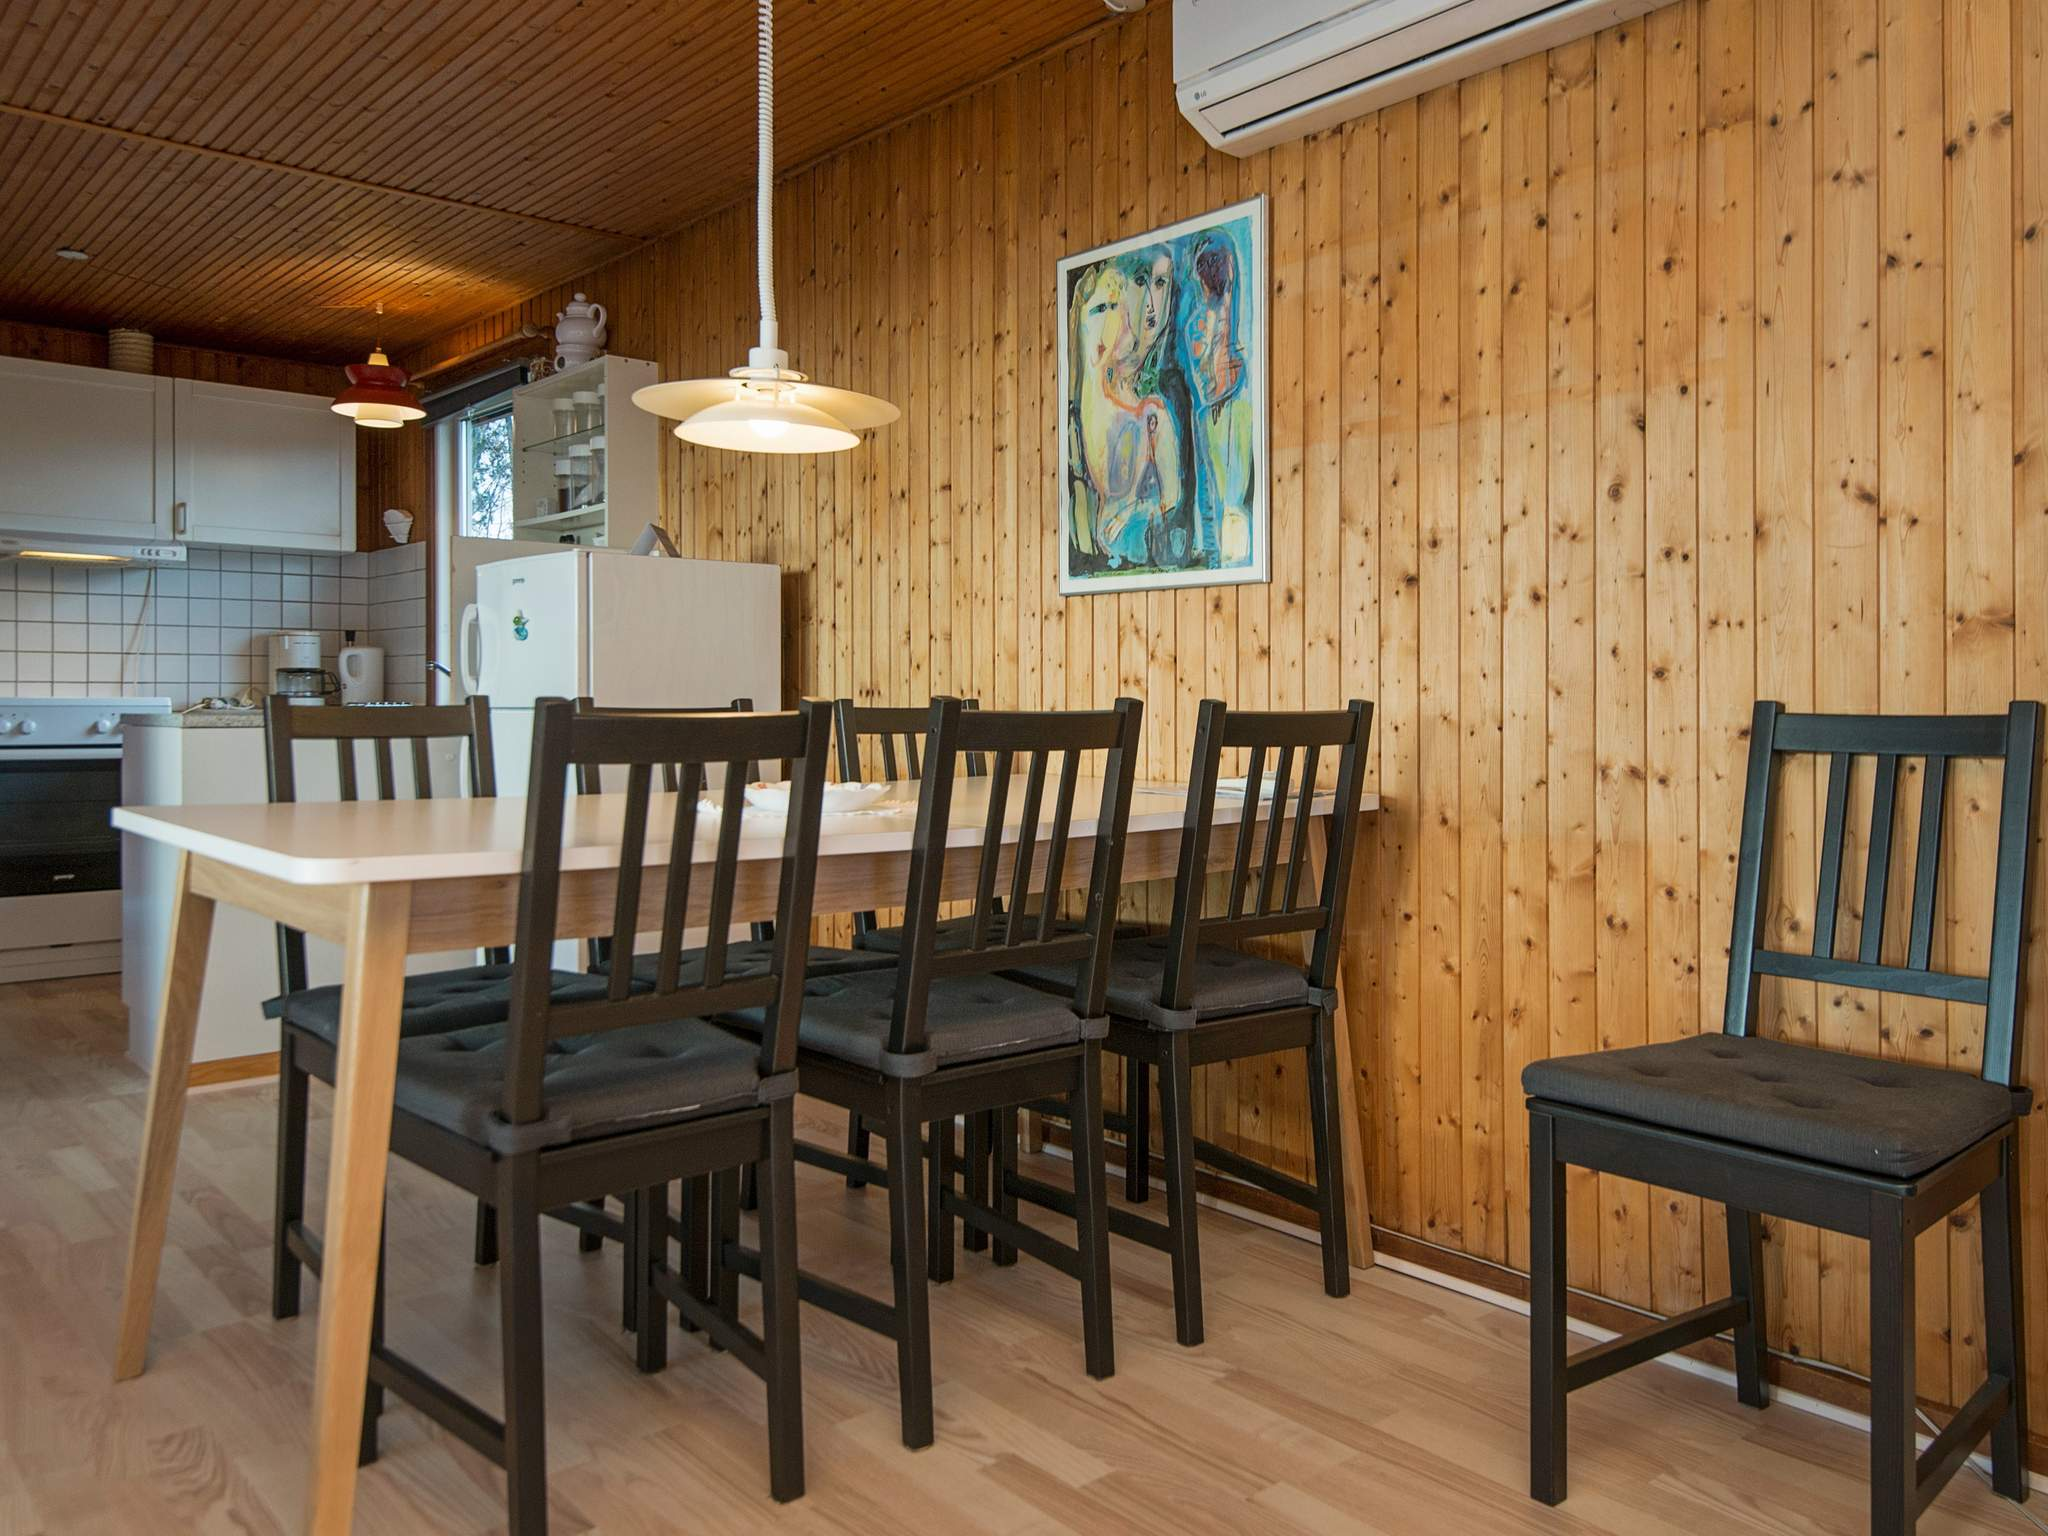 Ferienhaus Egsmark Strand (2390539), Egsmark, , Ostjütland, Dänemark, Bild 9